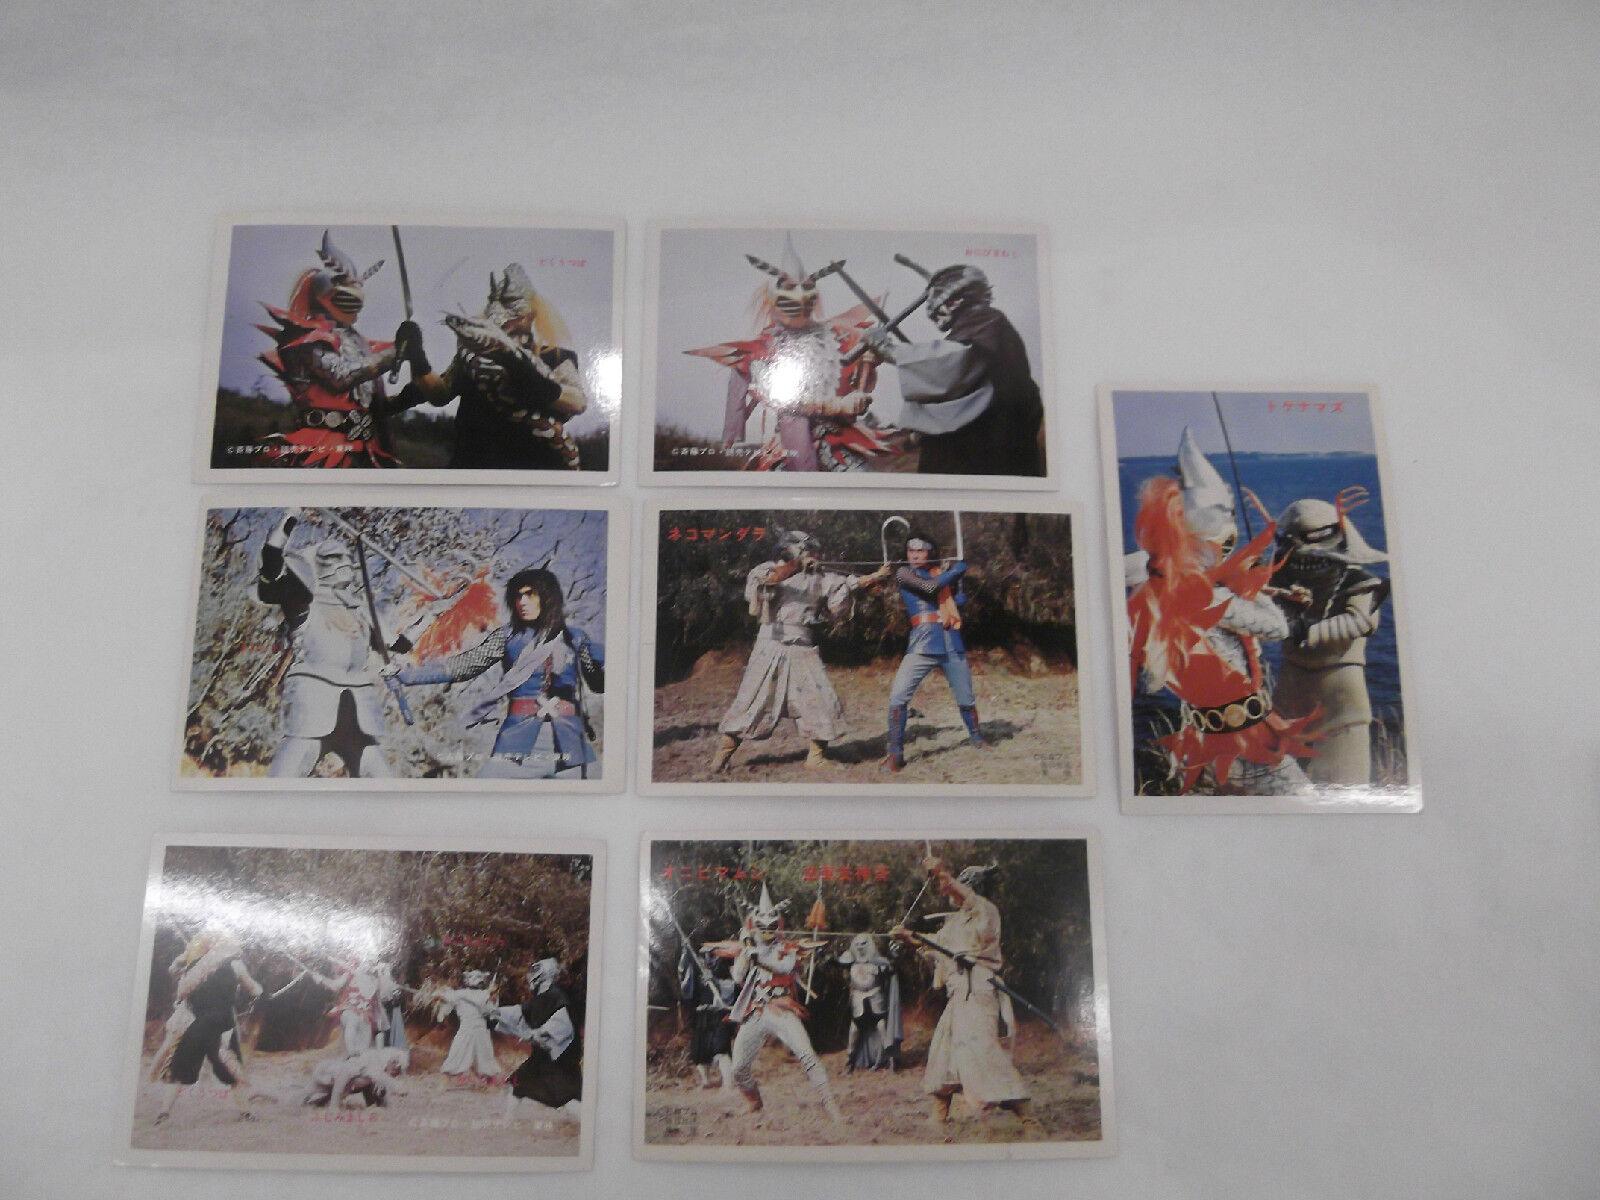 VINTAGE YAMAKATSU NINJA ARASHI  JAPANESE LARGE BROMIDE TRADING CARDS LOT OF 7